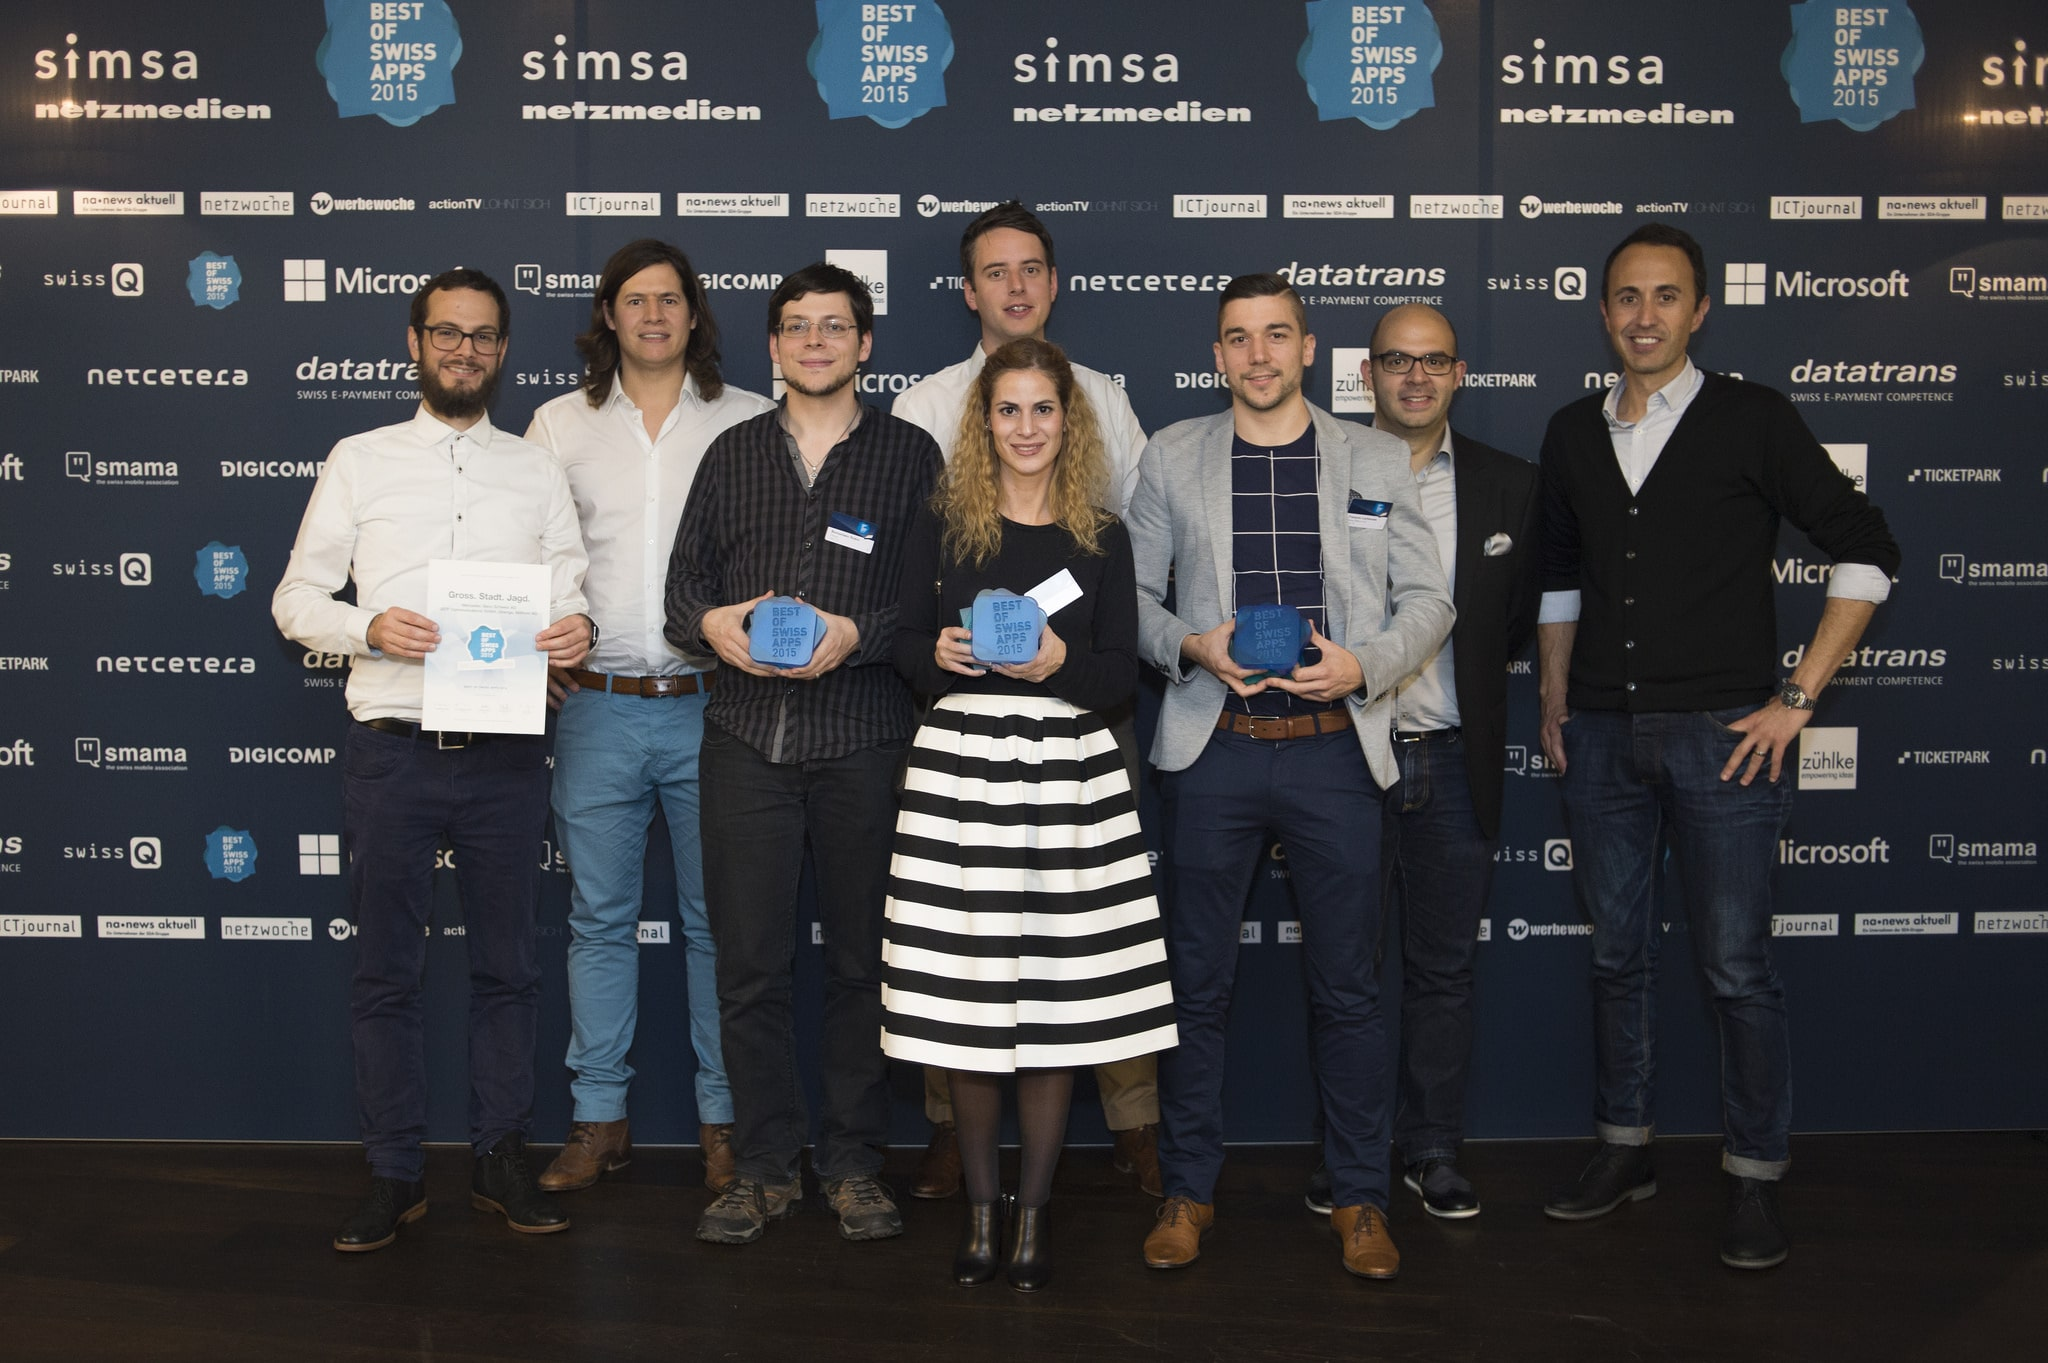 Winner group photo Best of Swiss Apps 2015 awards